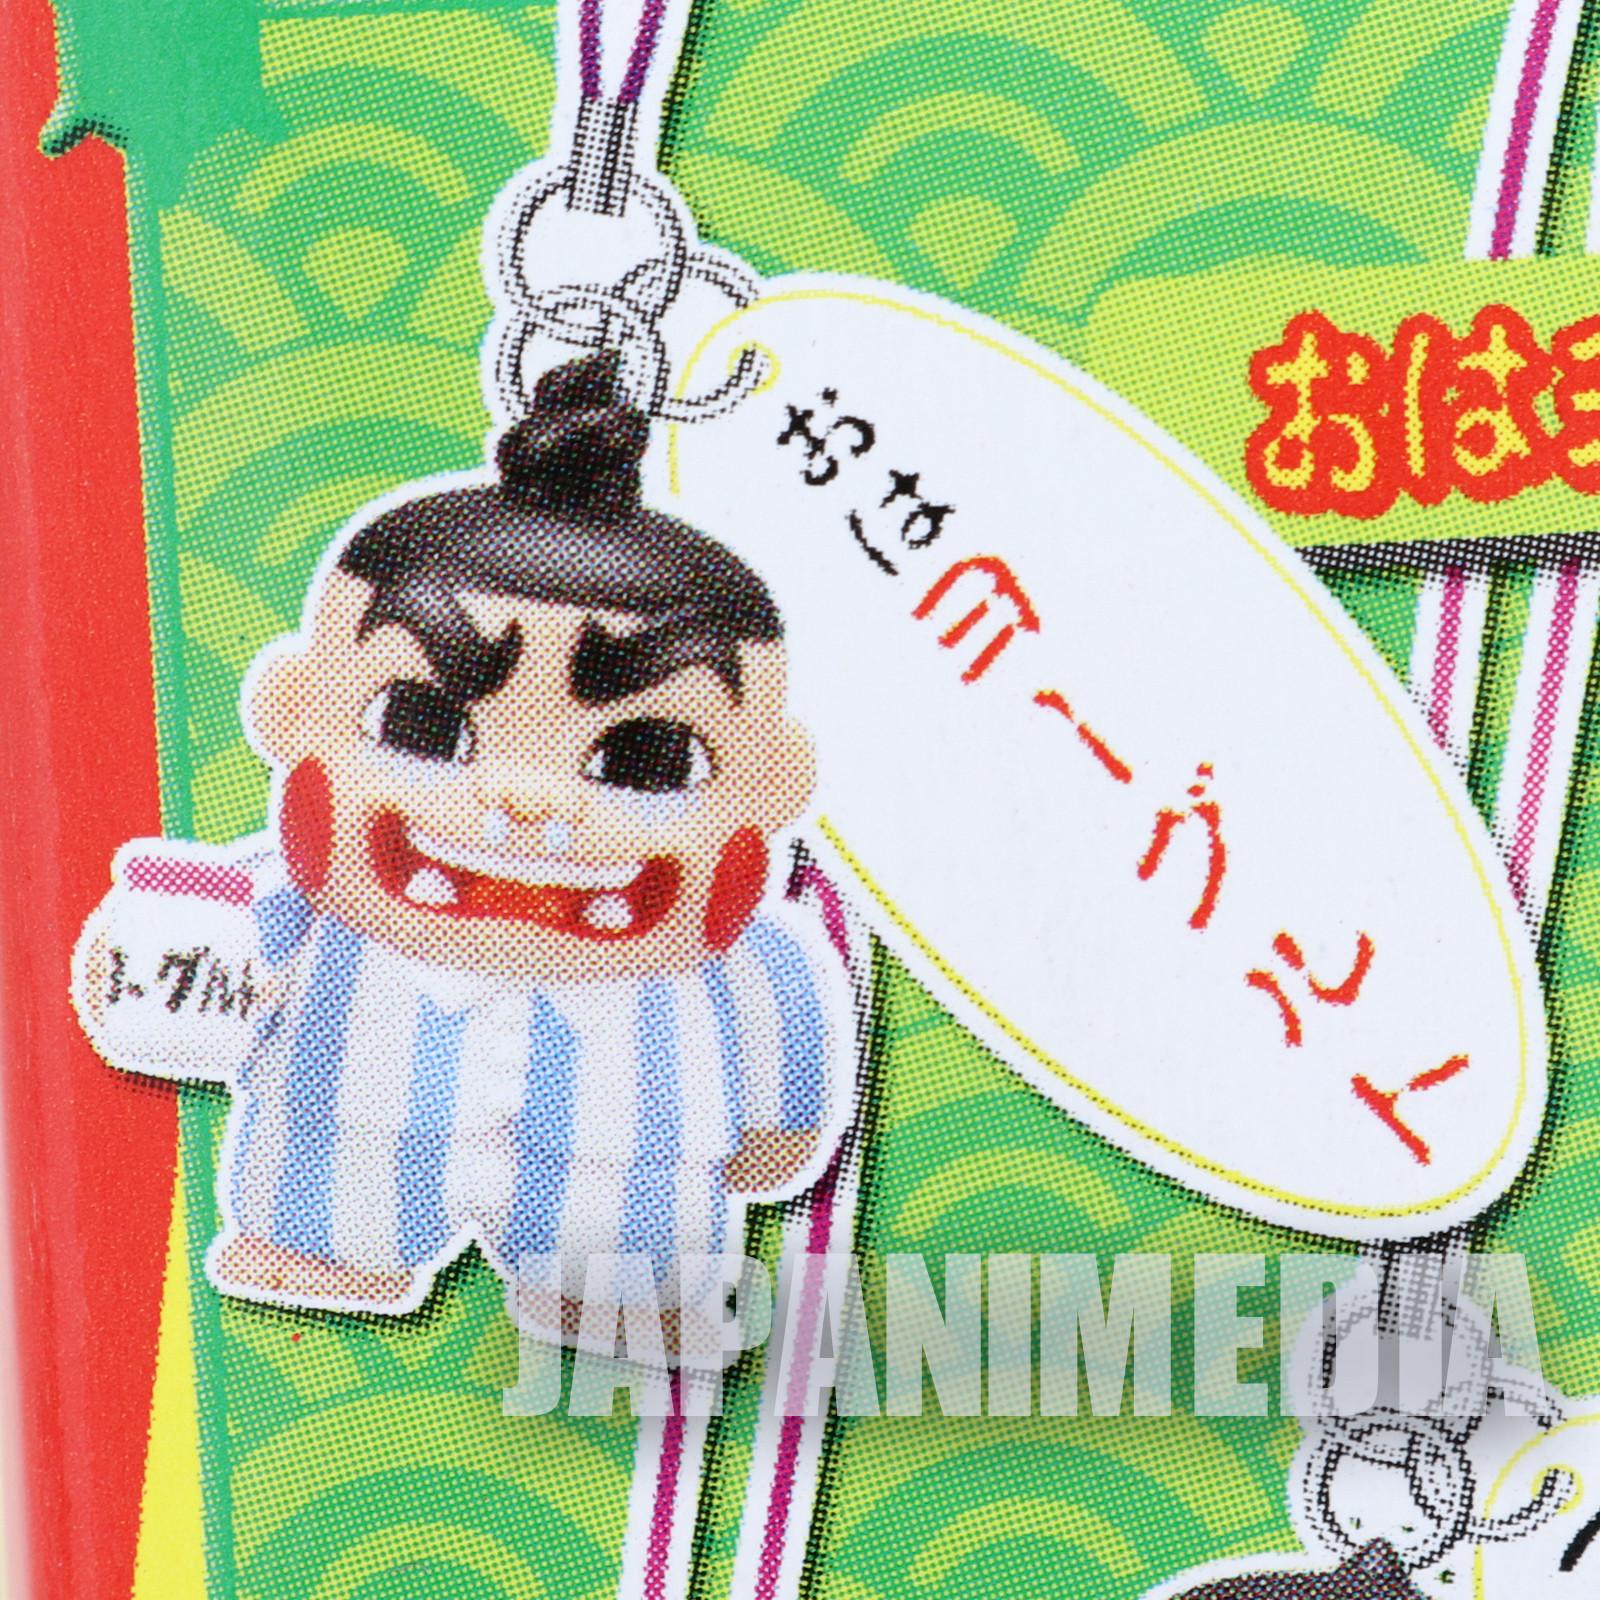 Obocchama-kun Figure Strap #1 JAPAN ANIME KOROKORO